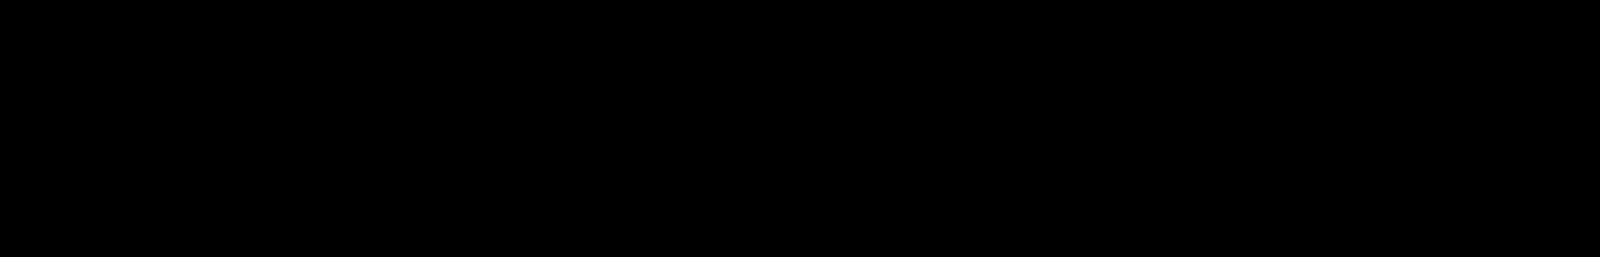 Playboy logo.